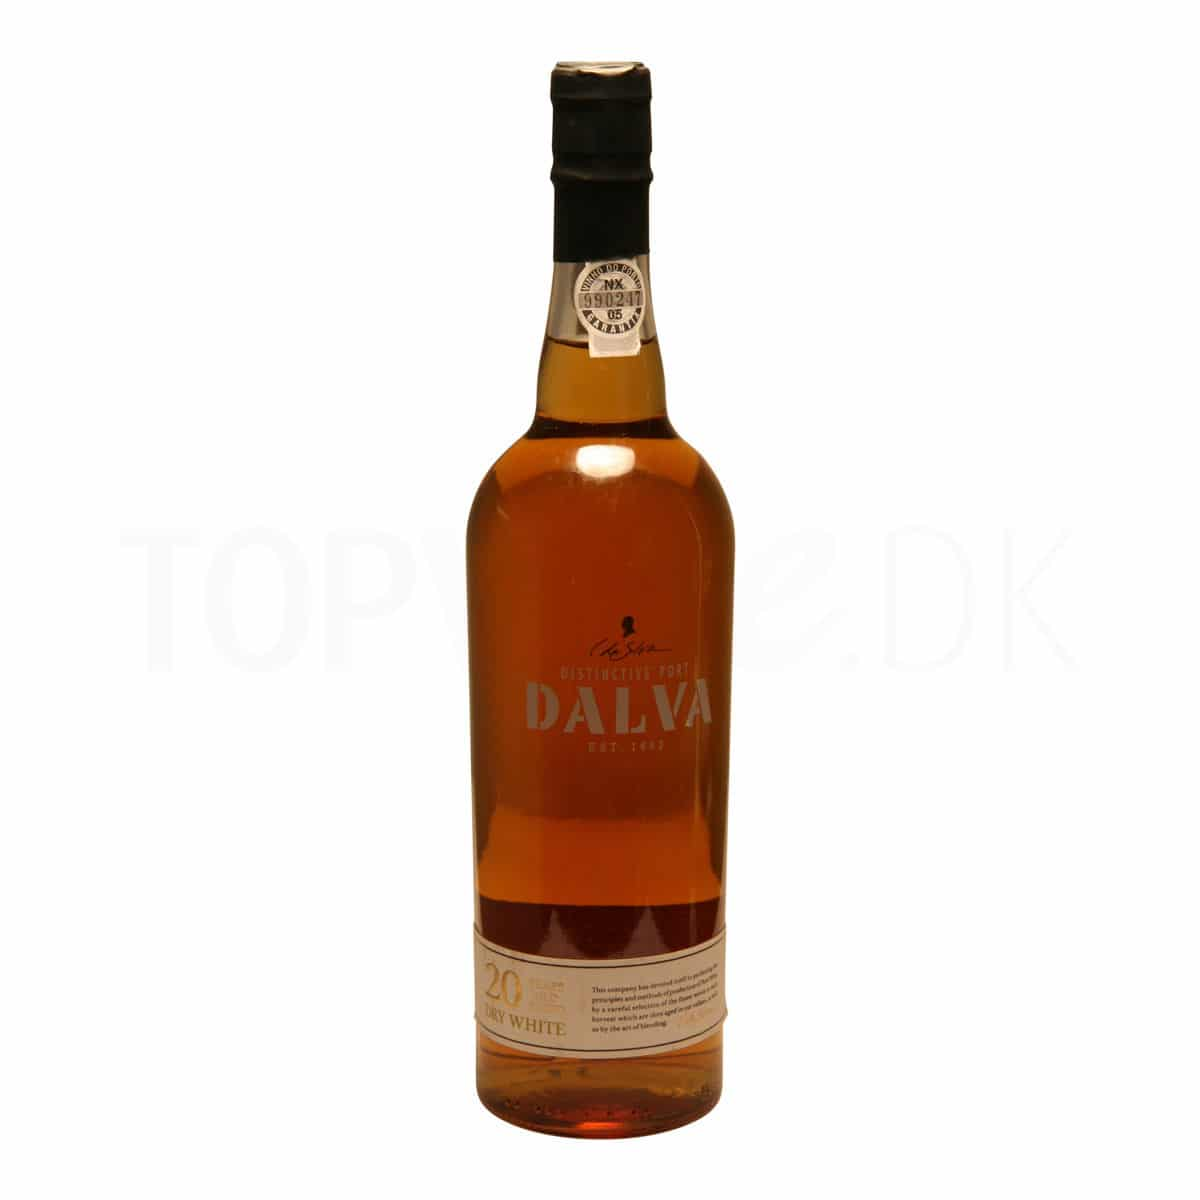 Topvine Dalva 20 _rs hvid port